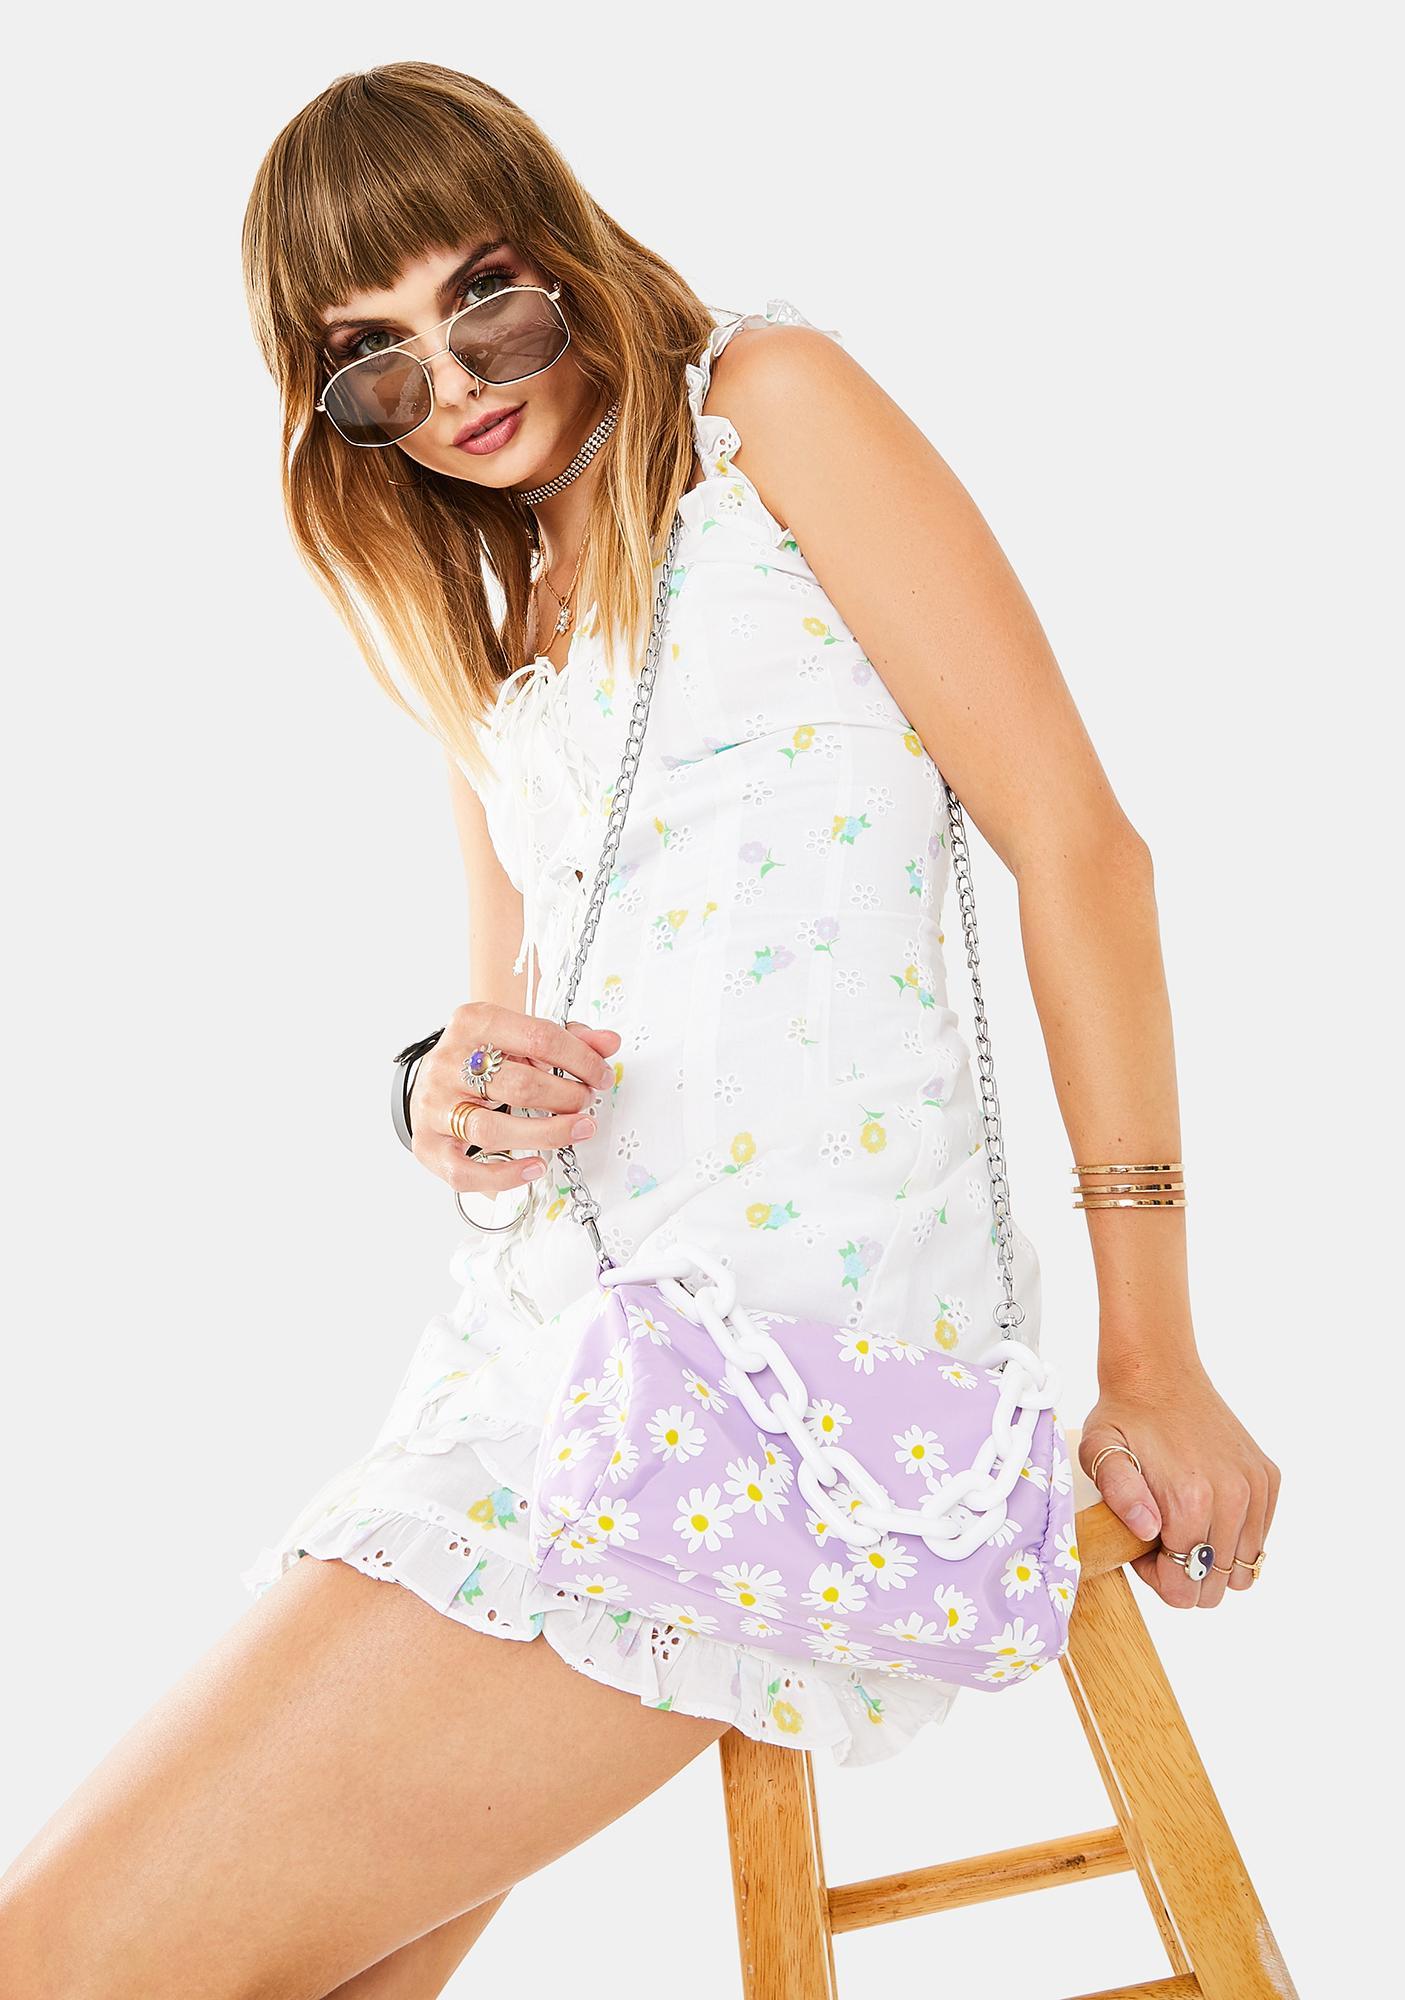 Fairy Makin You A Daisy Chain Bag